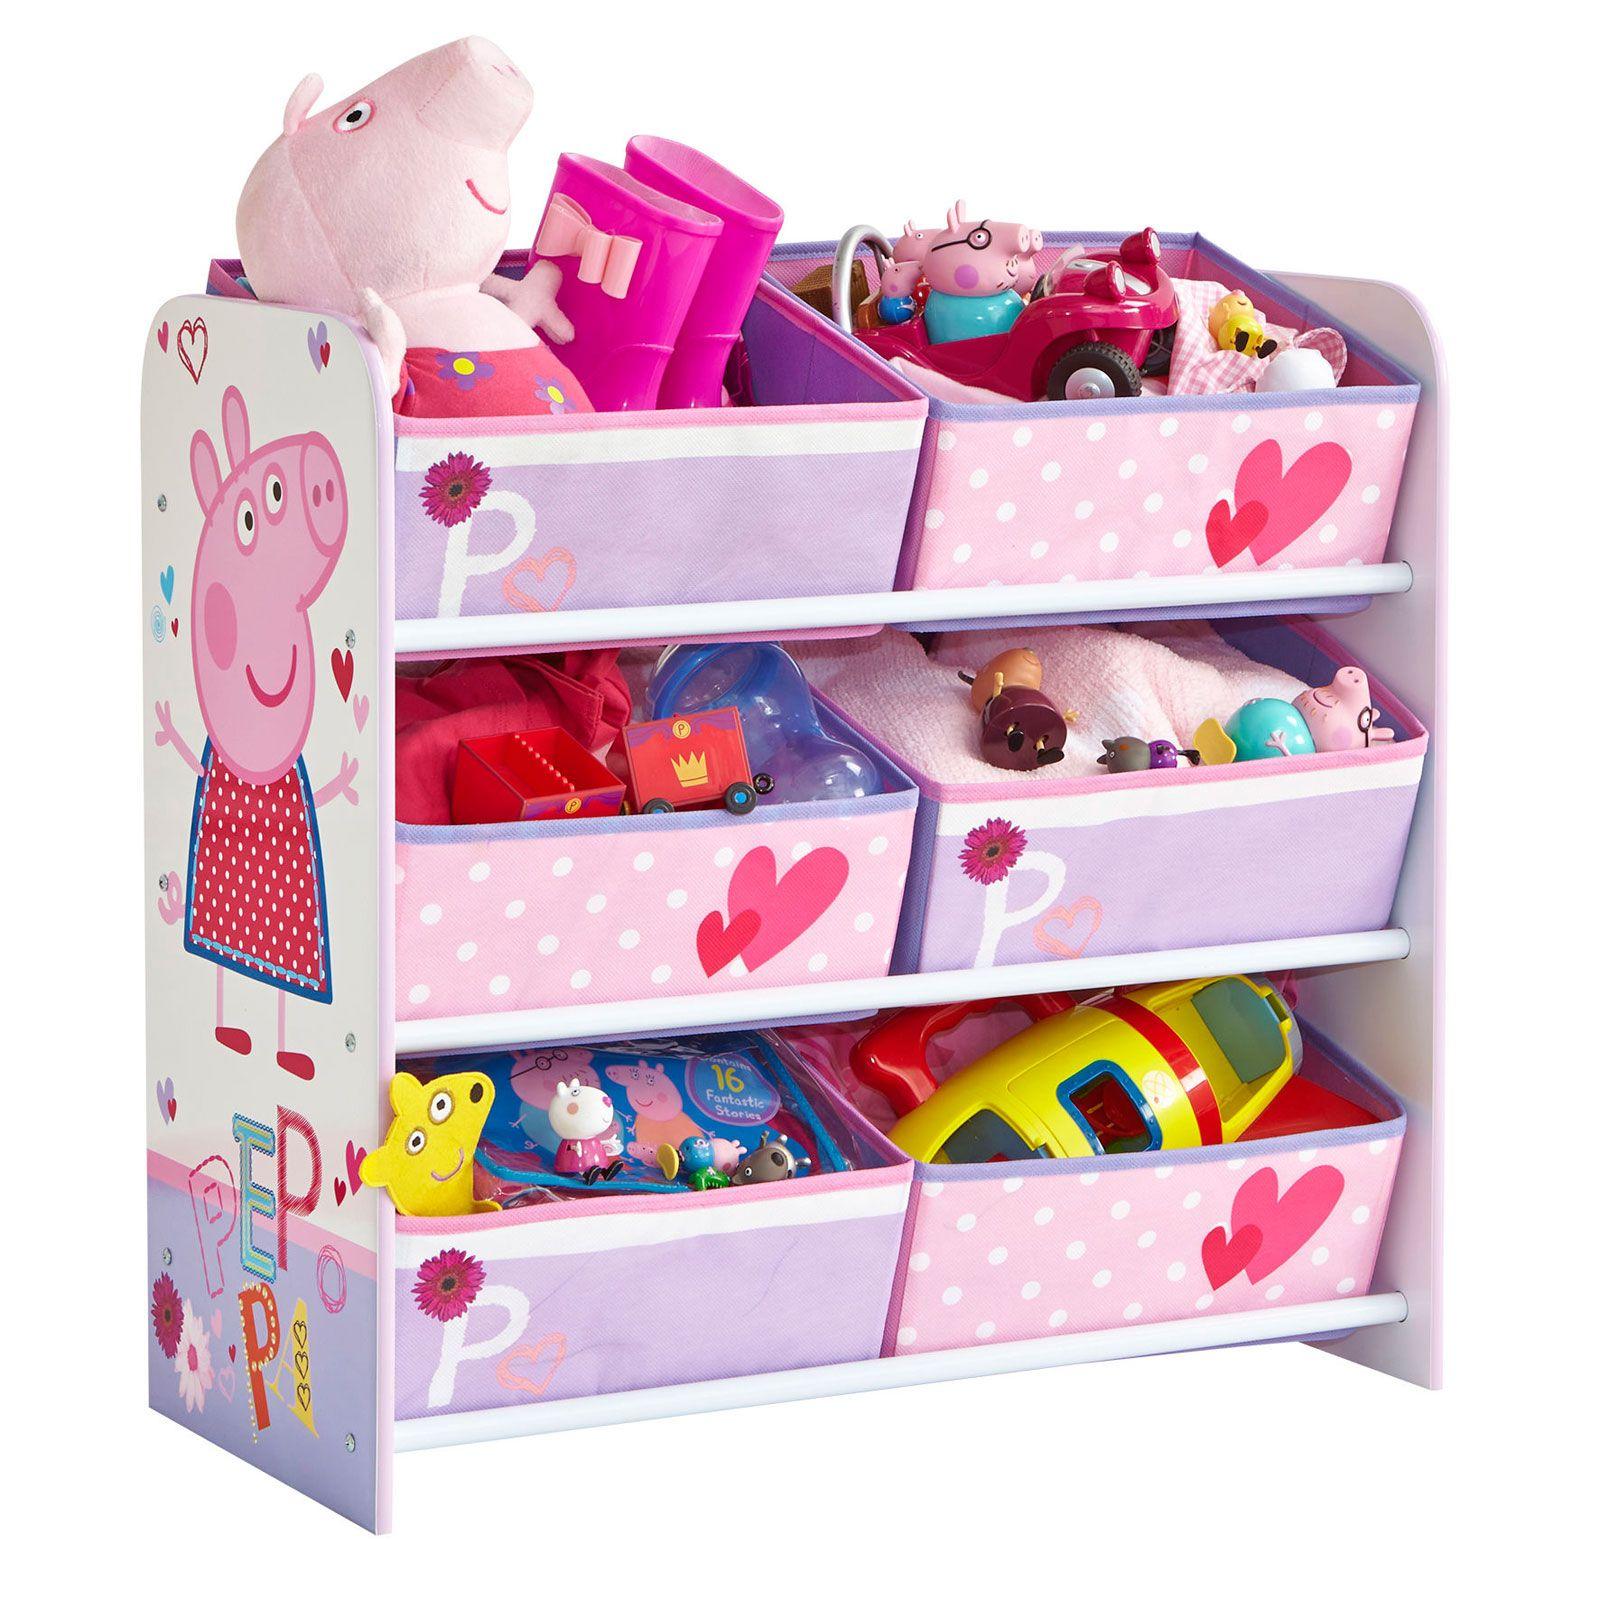 Peppa Pig Bedroom Decor Kids Character 6 Bin Storage Unit Bedroom Furniture Disney Peppa